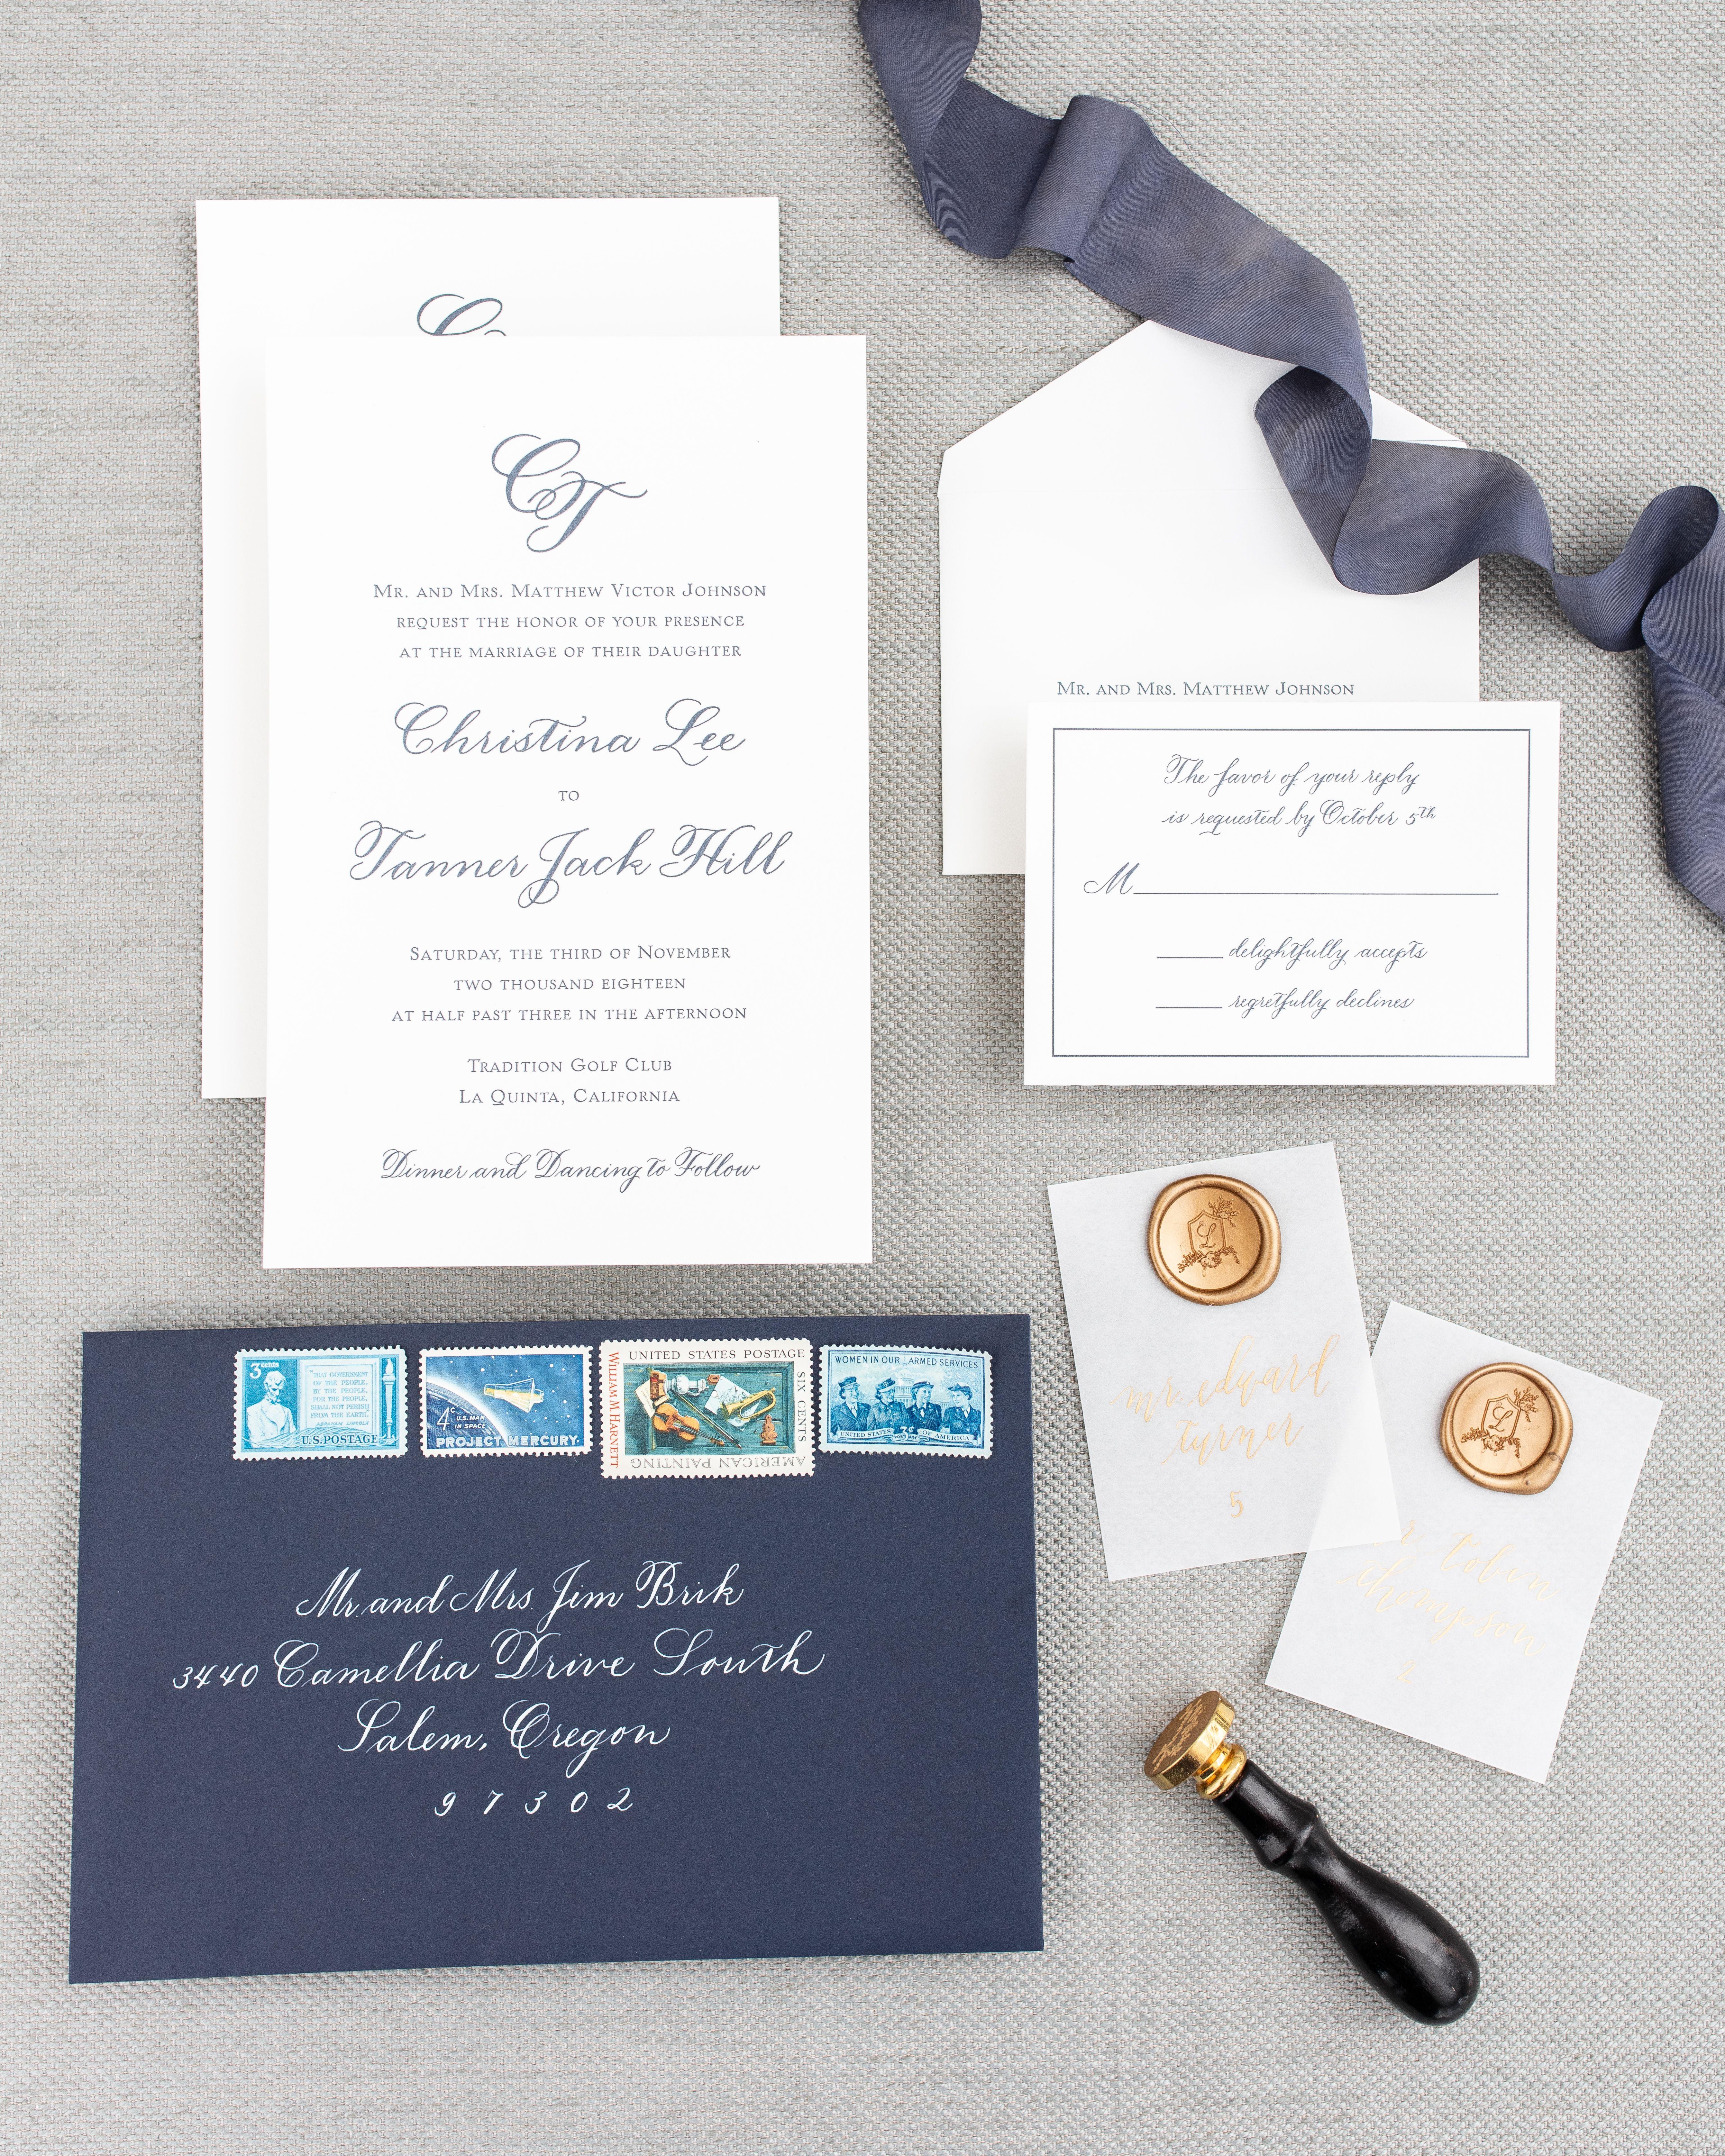 Custom Wedding Calligraphy Services Custom Wedding Calligraphy Minimalist Wedding Invitations Wedding Stationery